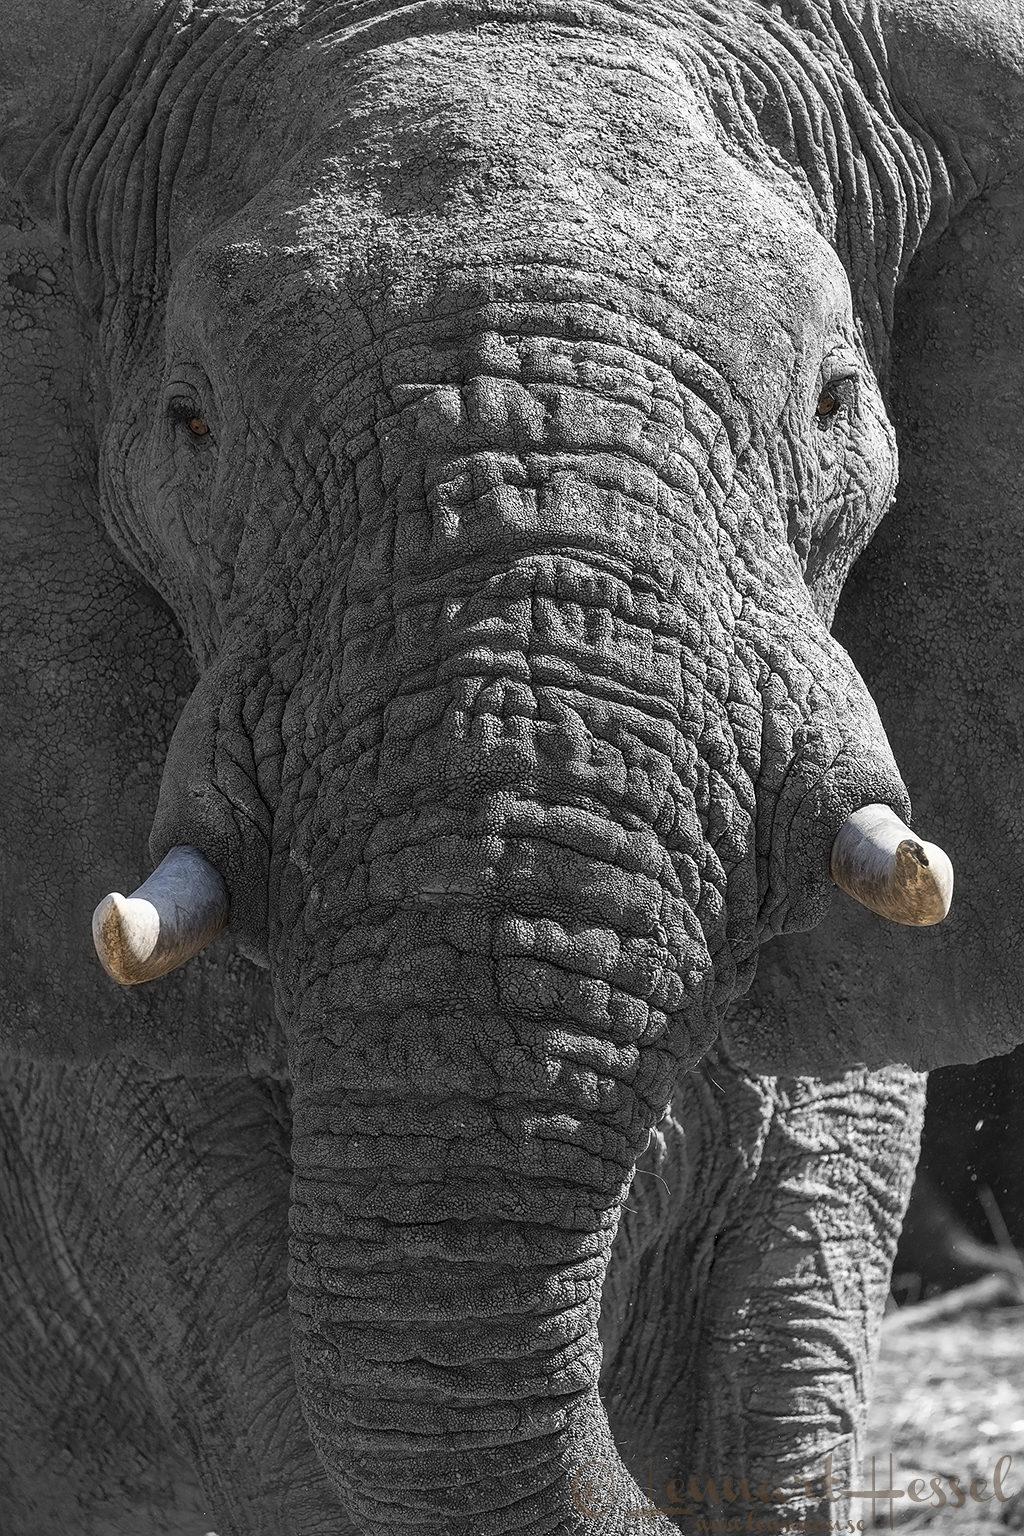 African Elephants of Zakouma National Park Chad Salamat